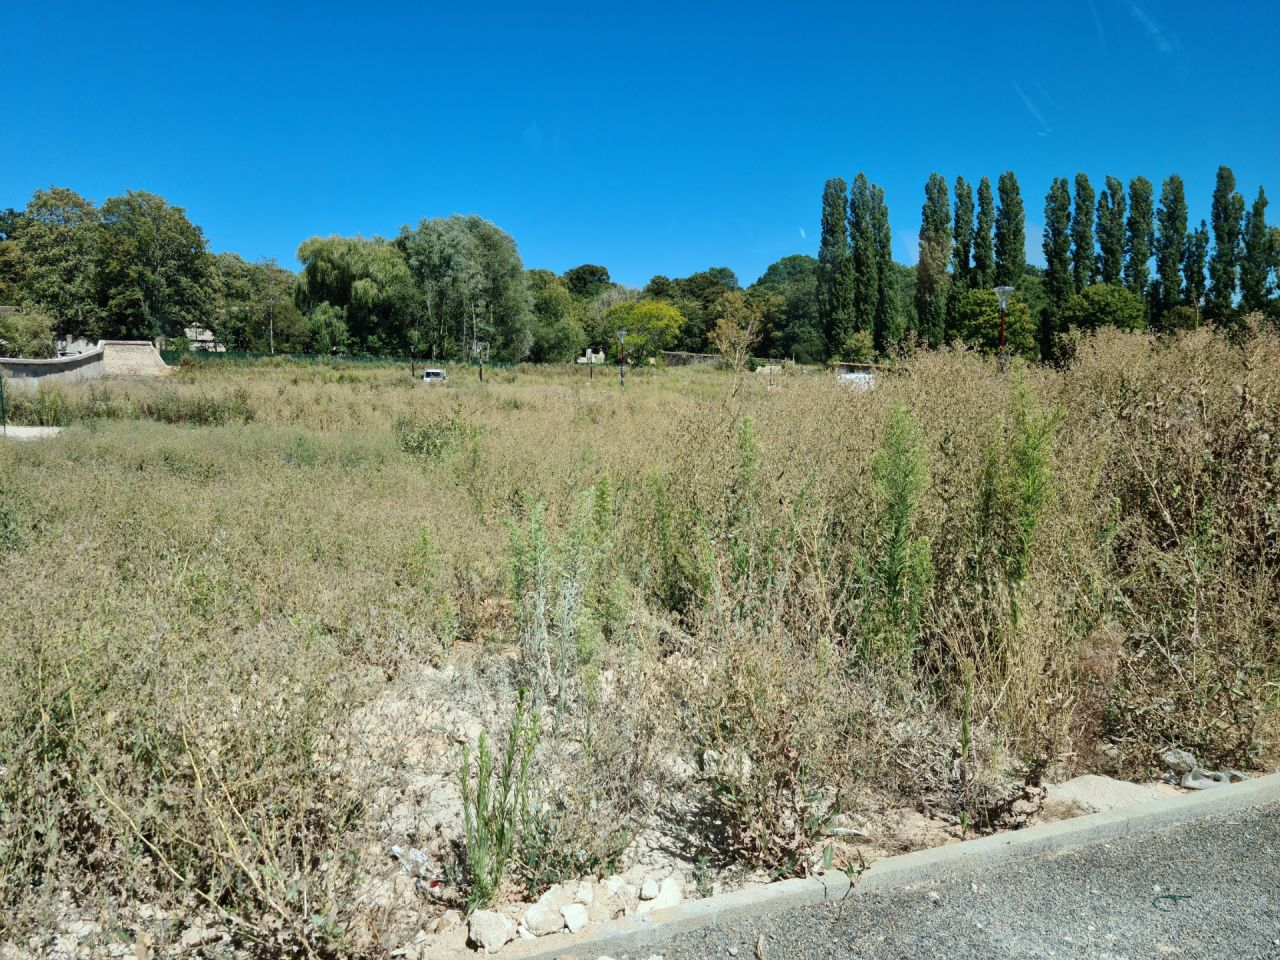 Terrain en herbe